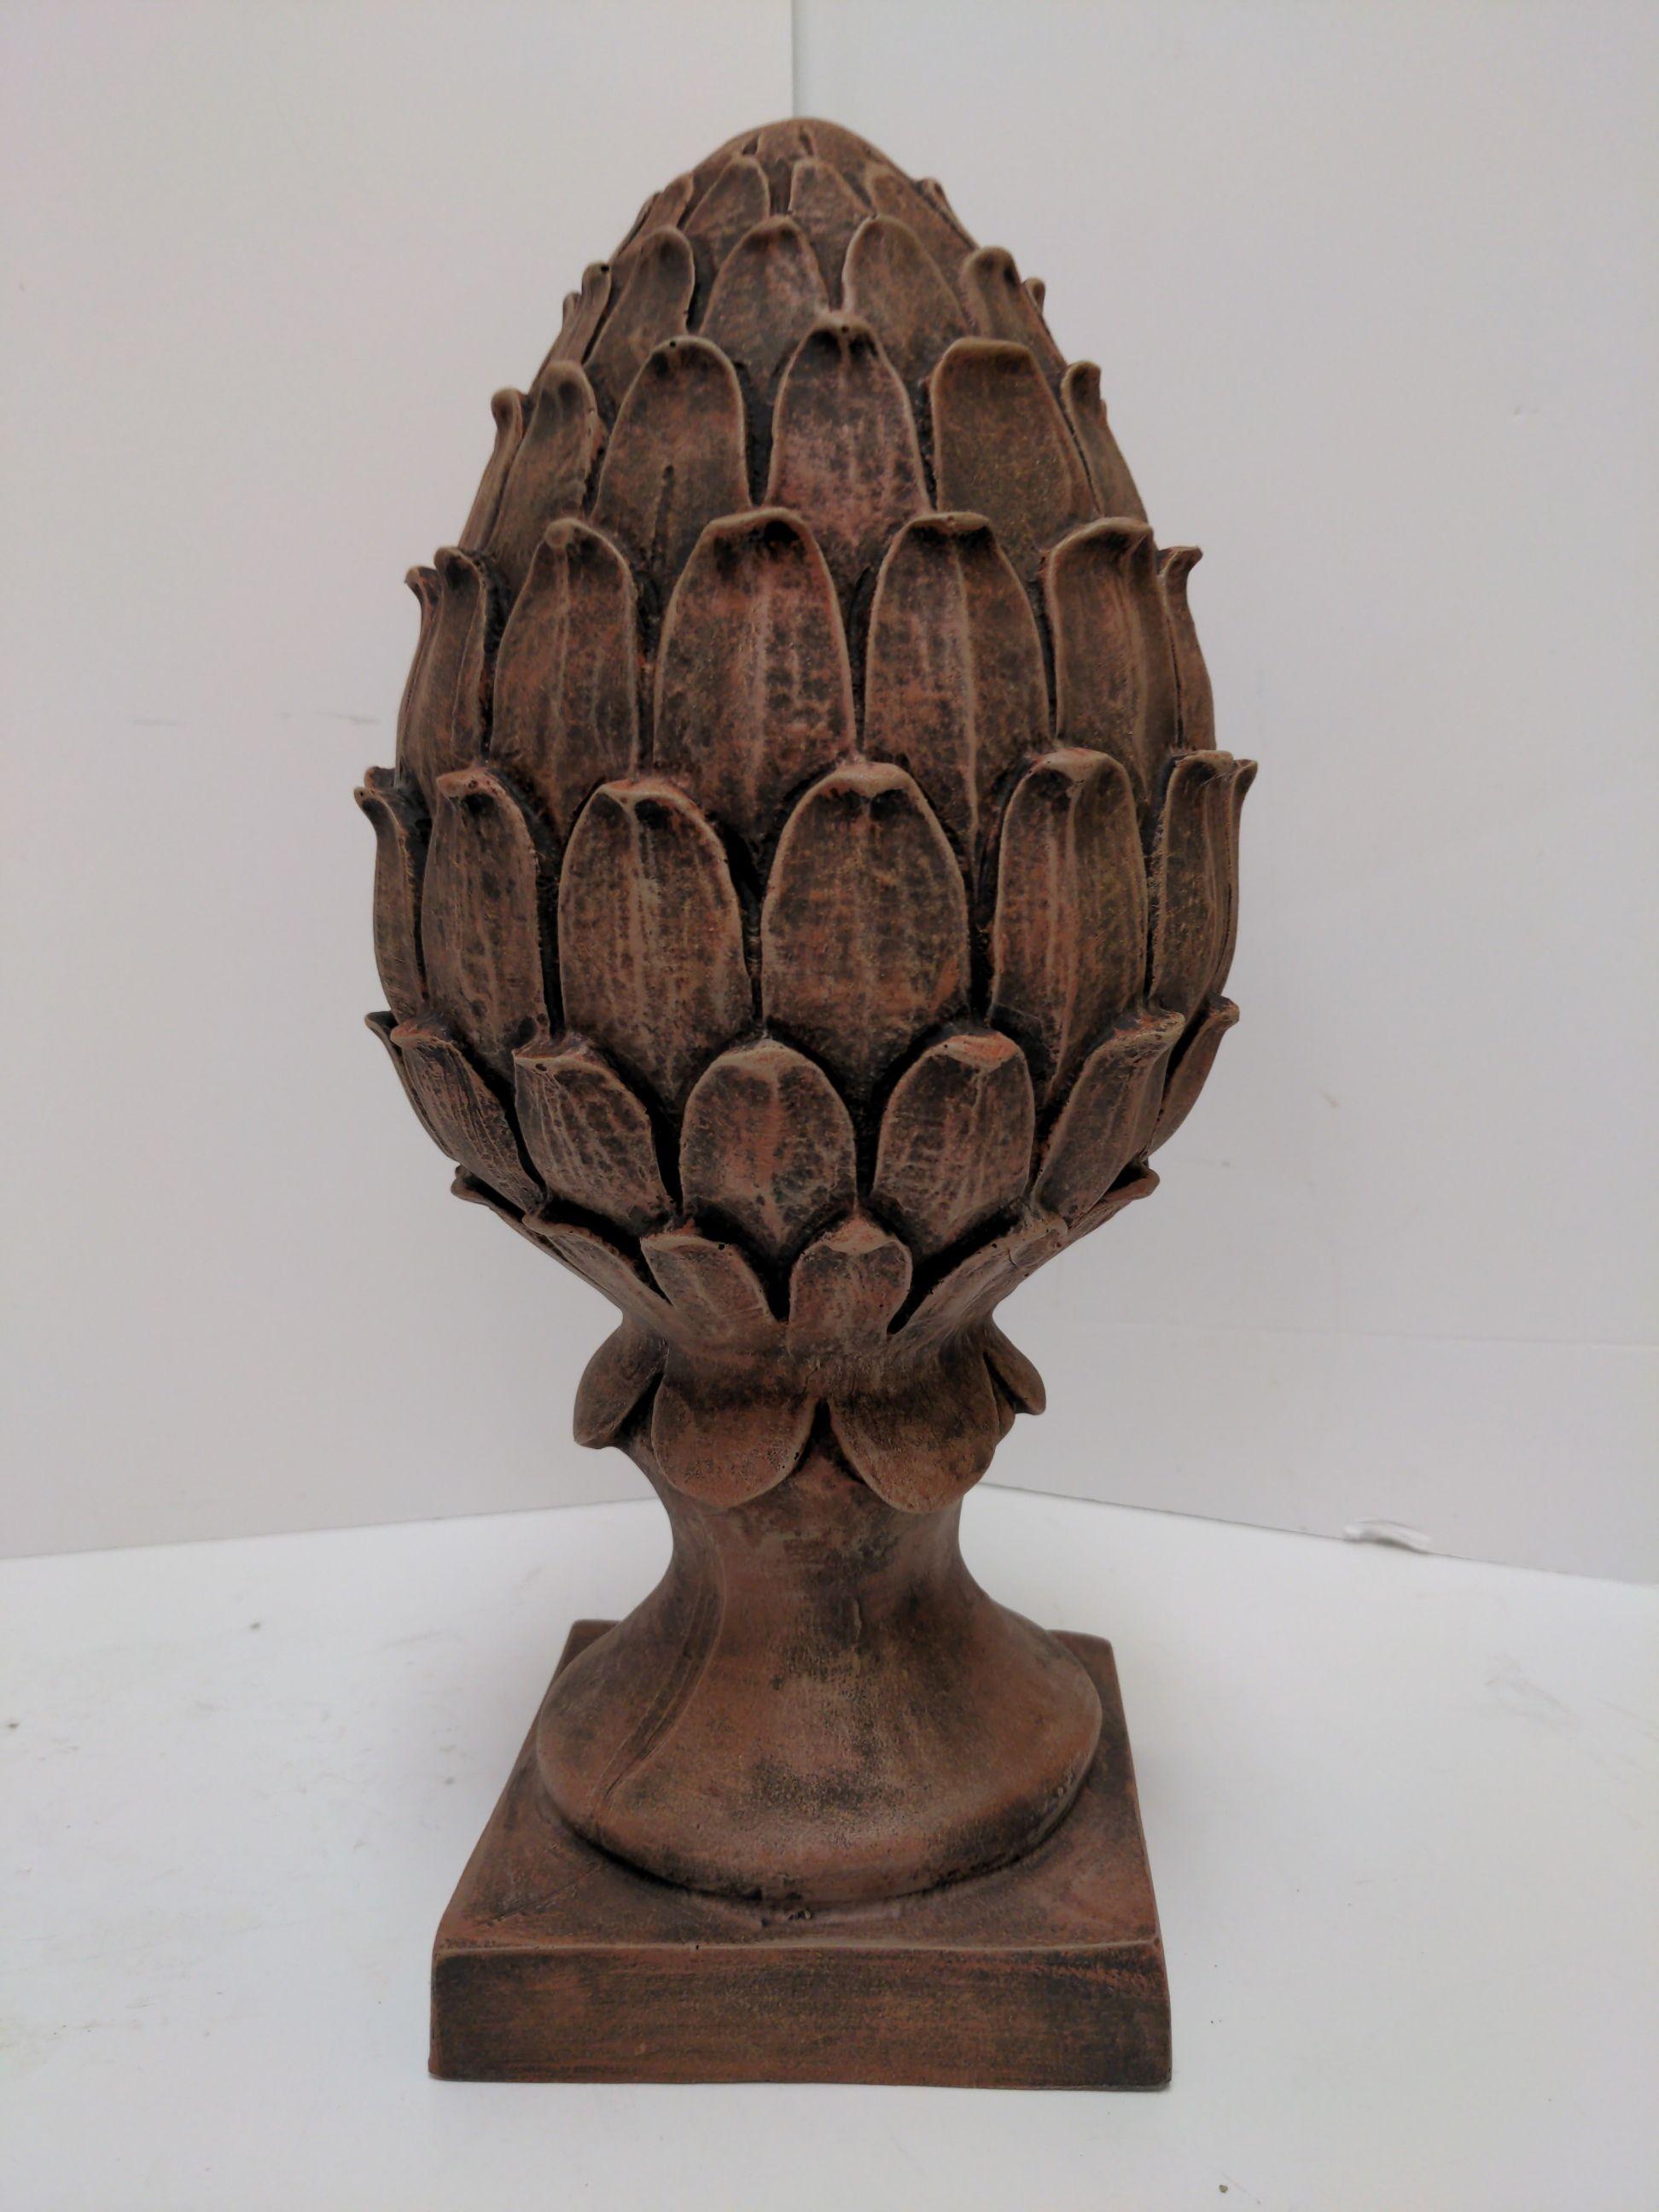 Craft-Tex 6310B Pineapple Finial Statue Brick